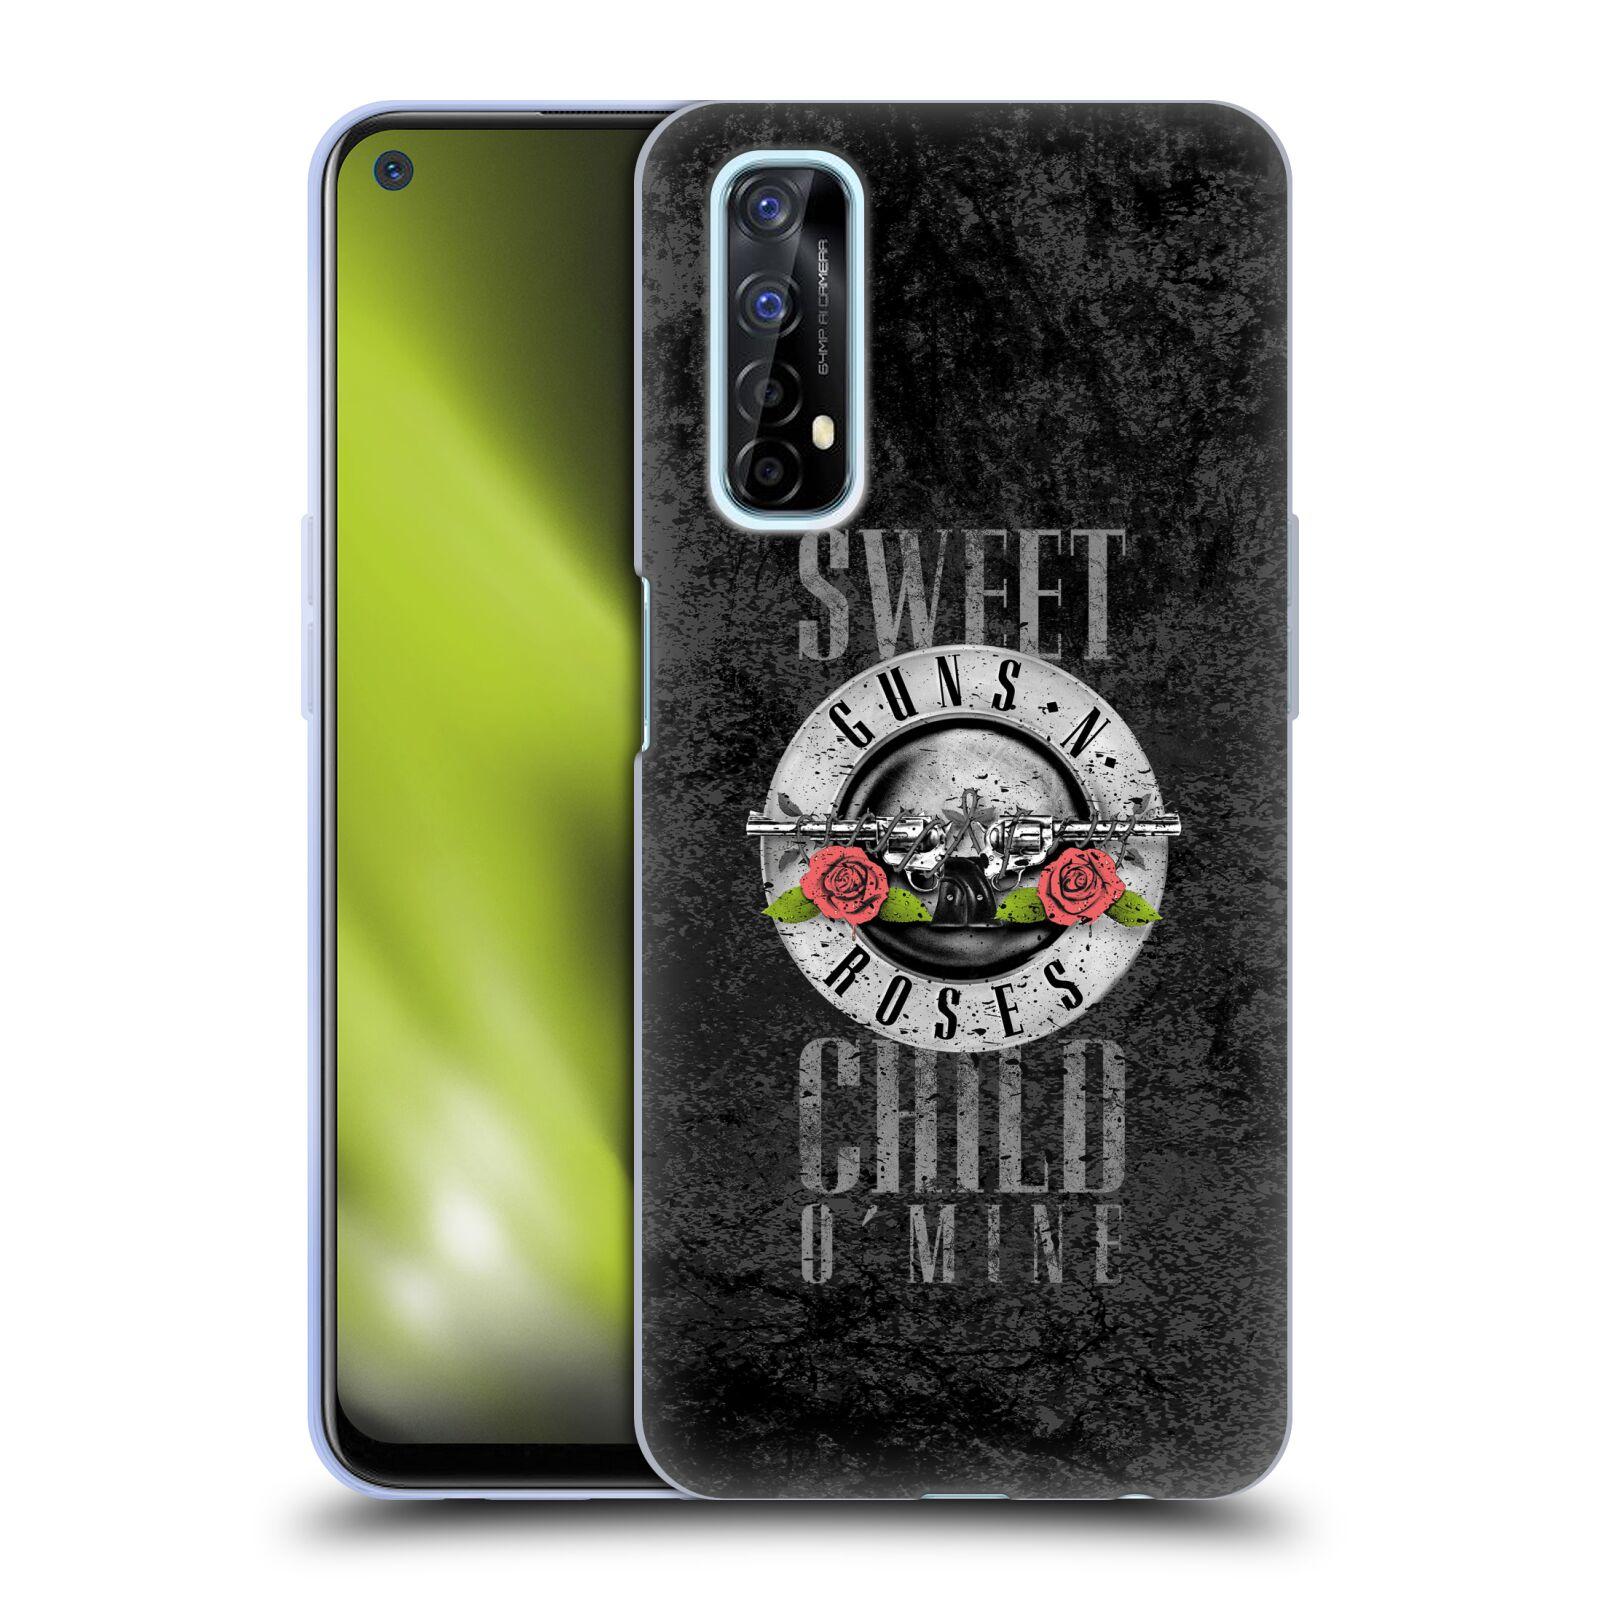 Silikonové pouzdro na mobil Realme 7 - Head Case - Guns N' Roses - Sweet Child